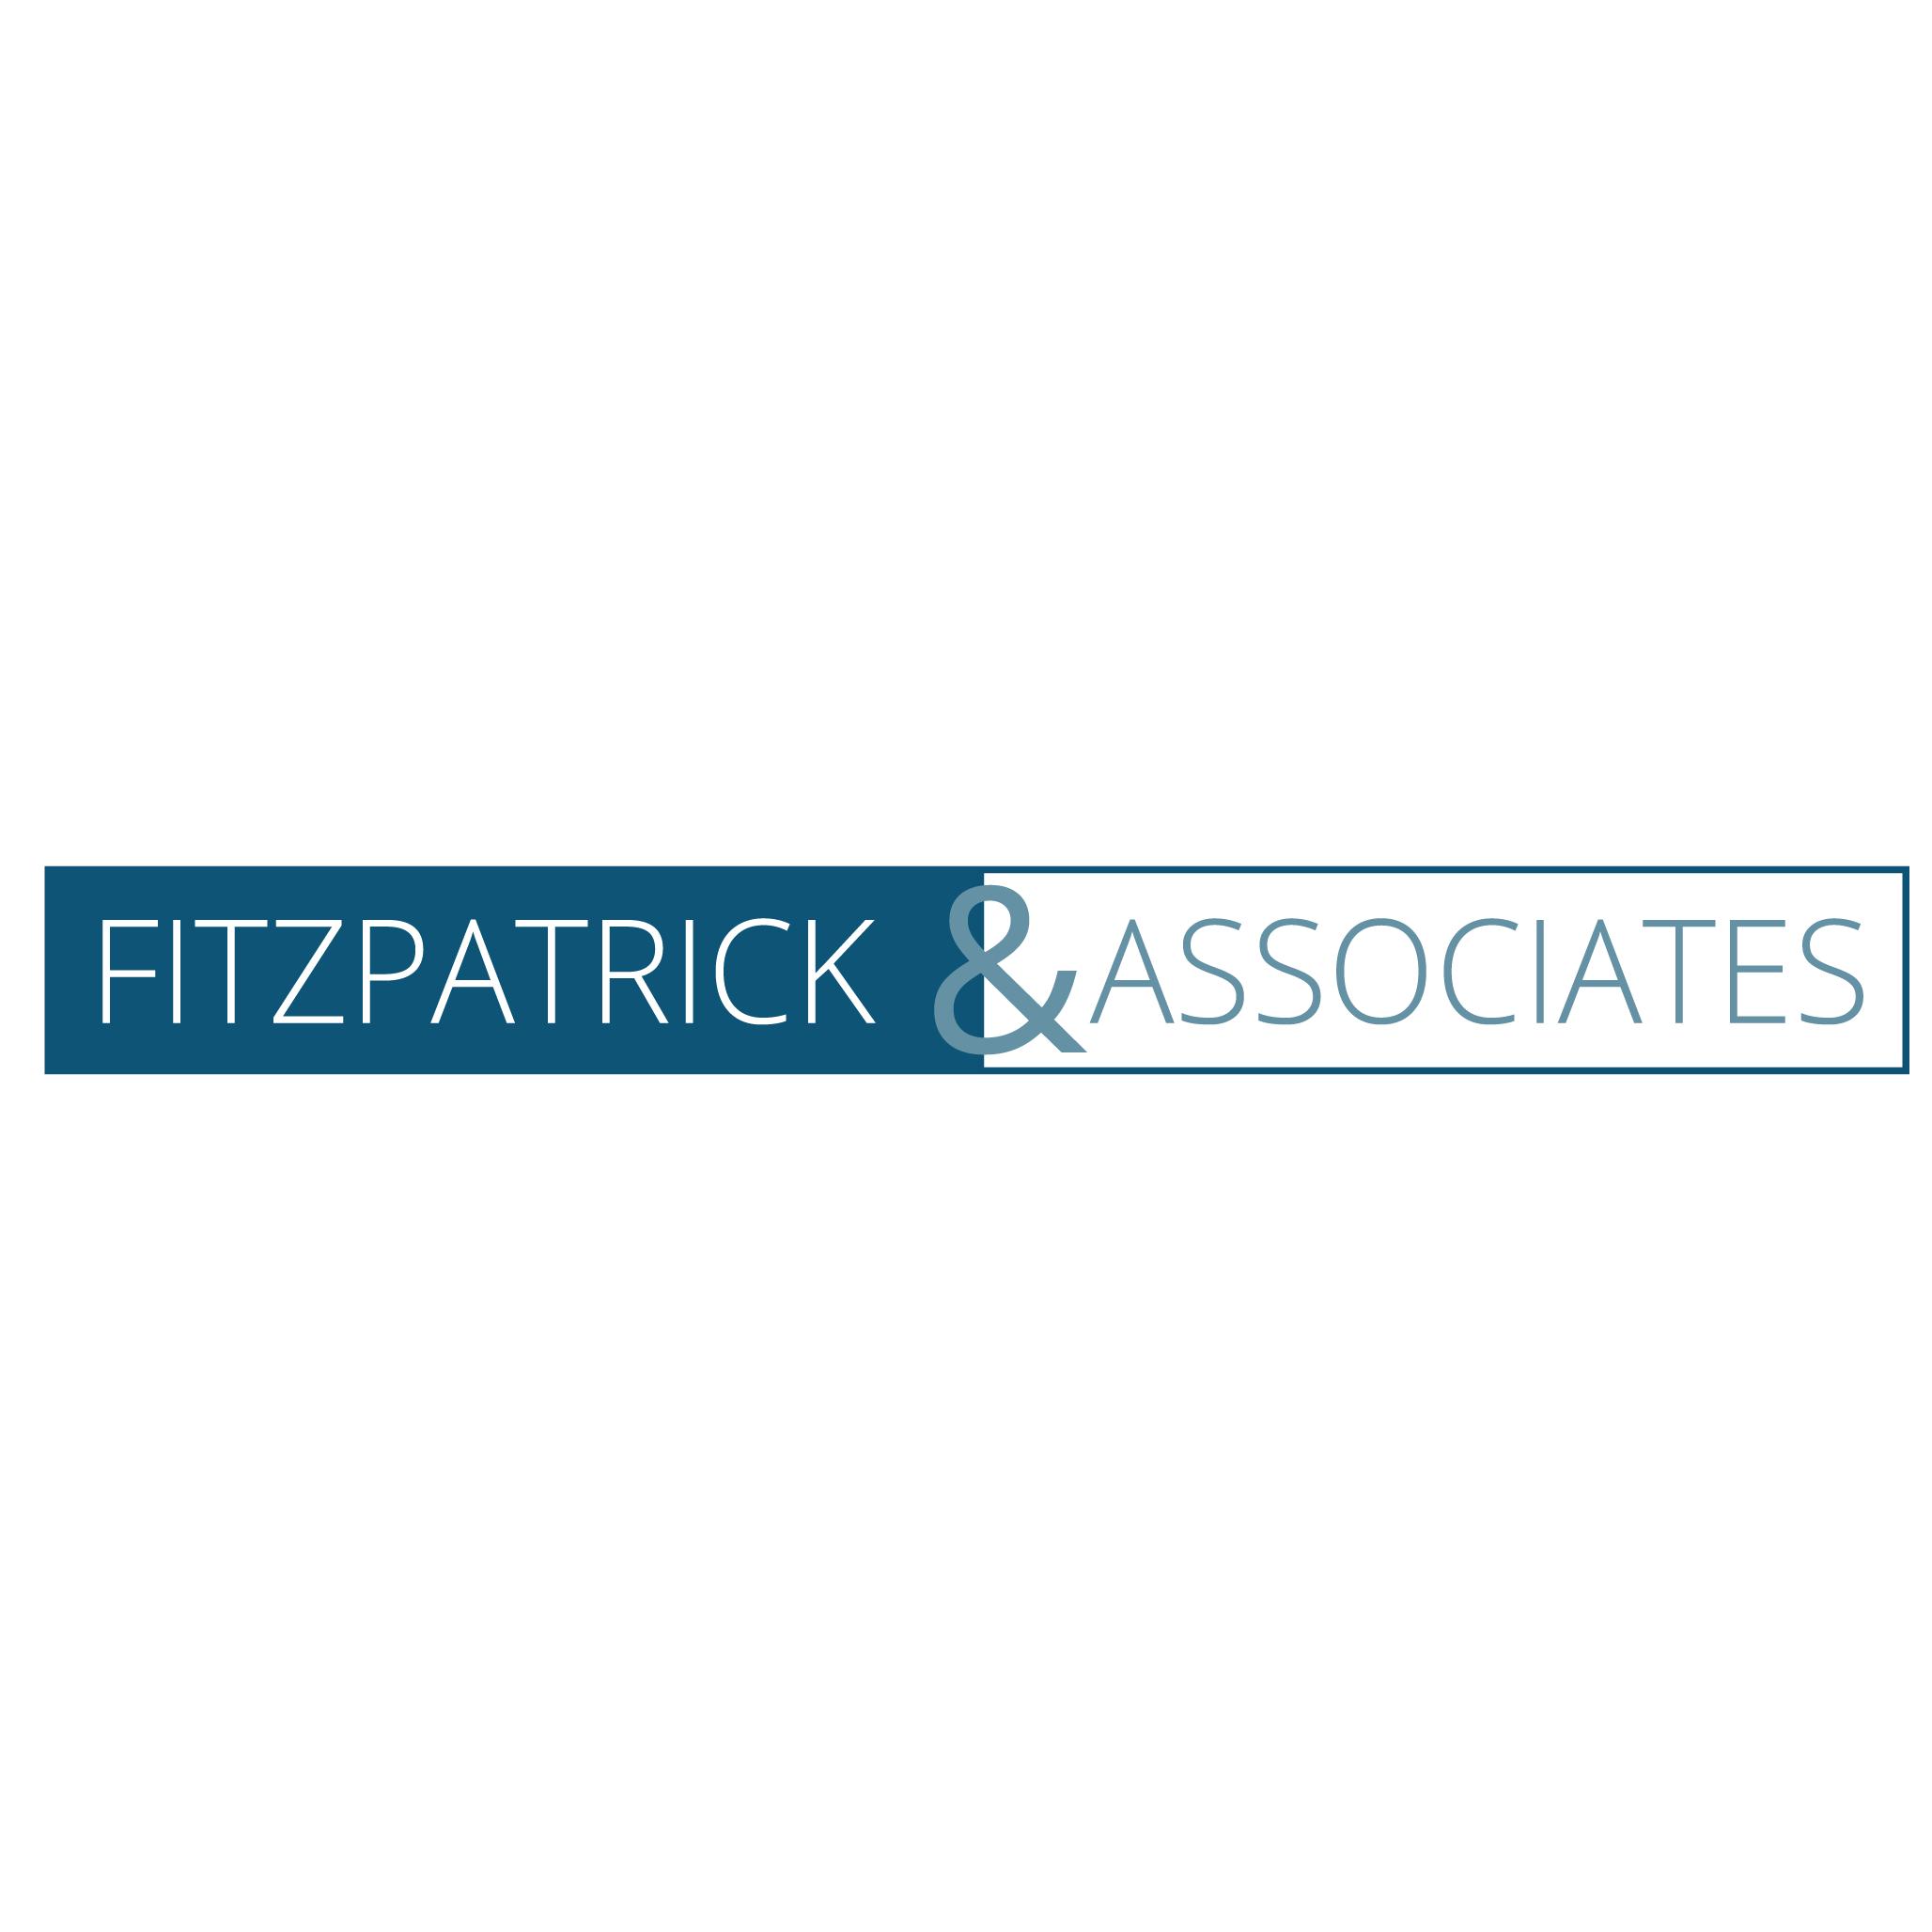 photo of Fitzpatrick & Associates